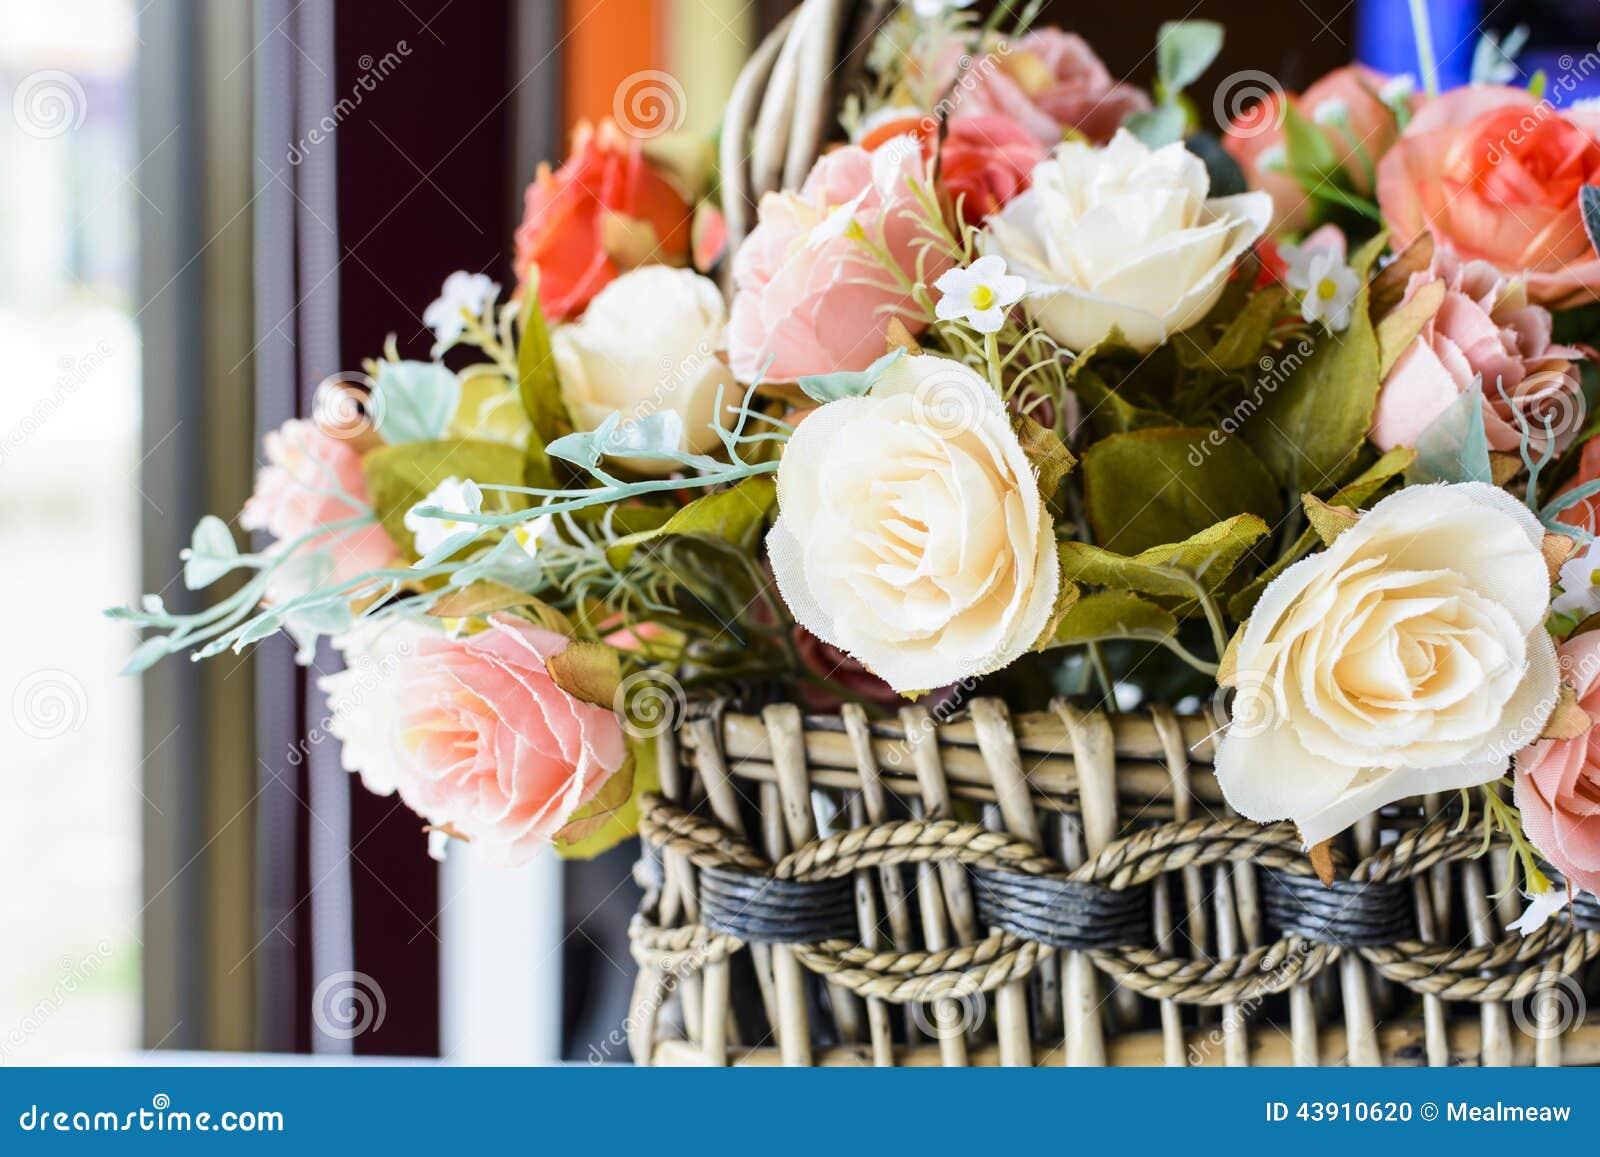 Beautiful flowers in basket on wooden table stock photo image of beautiful flowers in basket on wooden table stock photo image of background coffee 43910620 izmirmasajfo